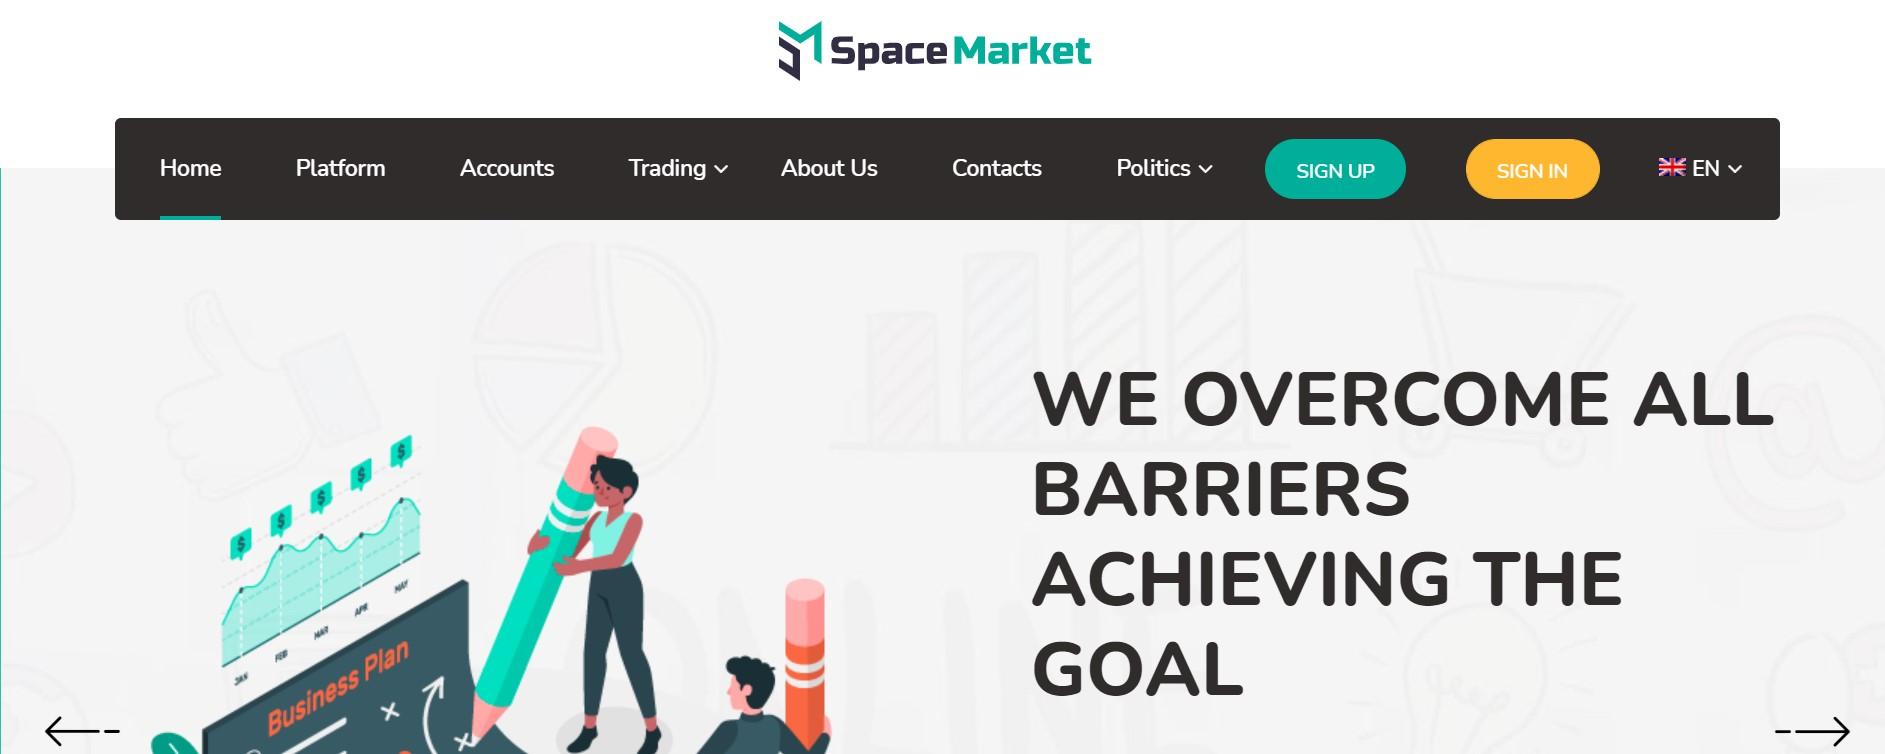 Space Market website